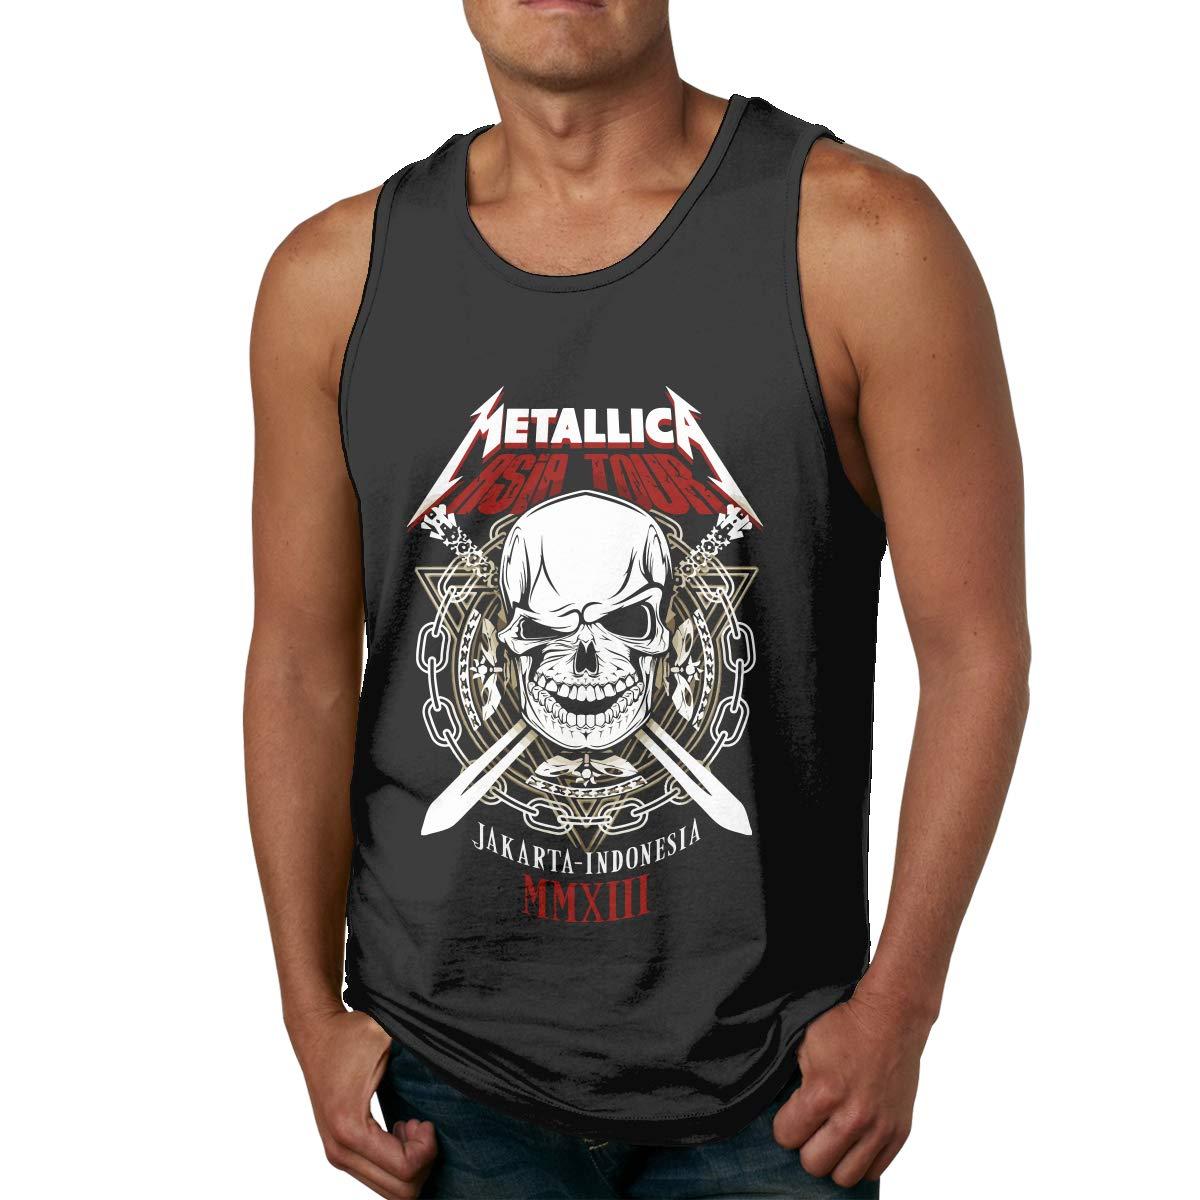 LixuA Mens Metallica All-Over Print Tank Top Slim Fit Muscle Shirt